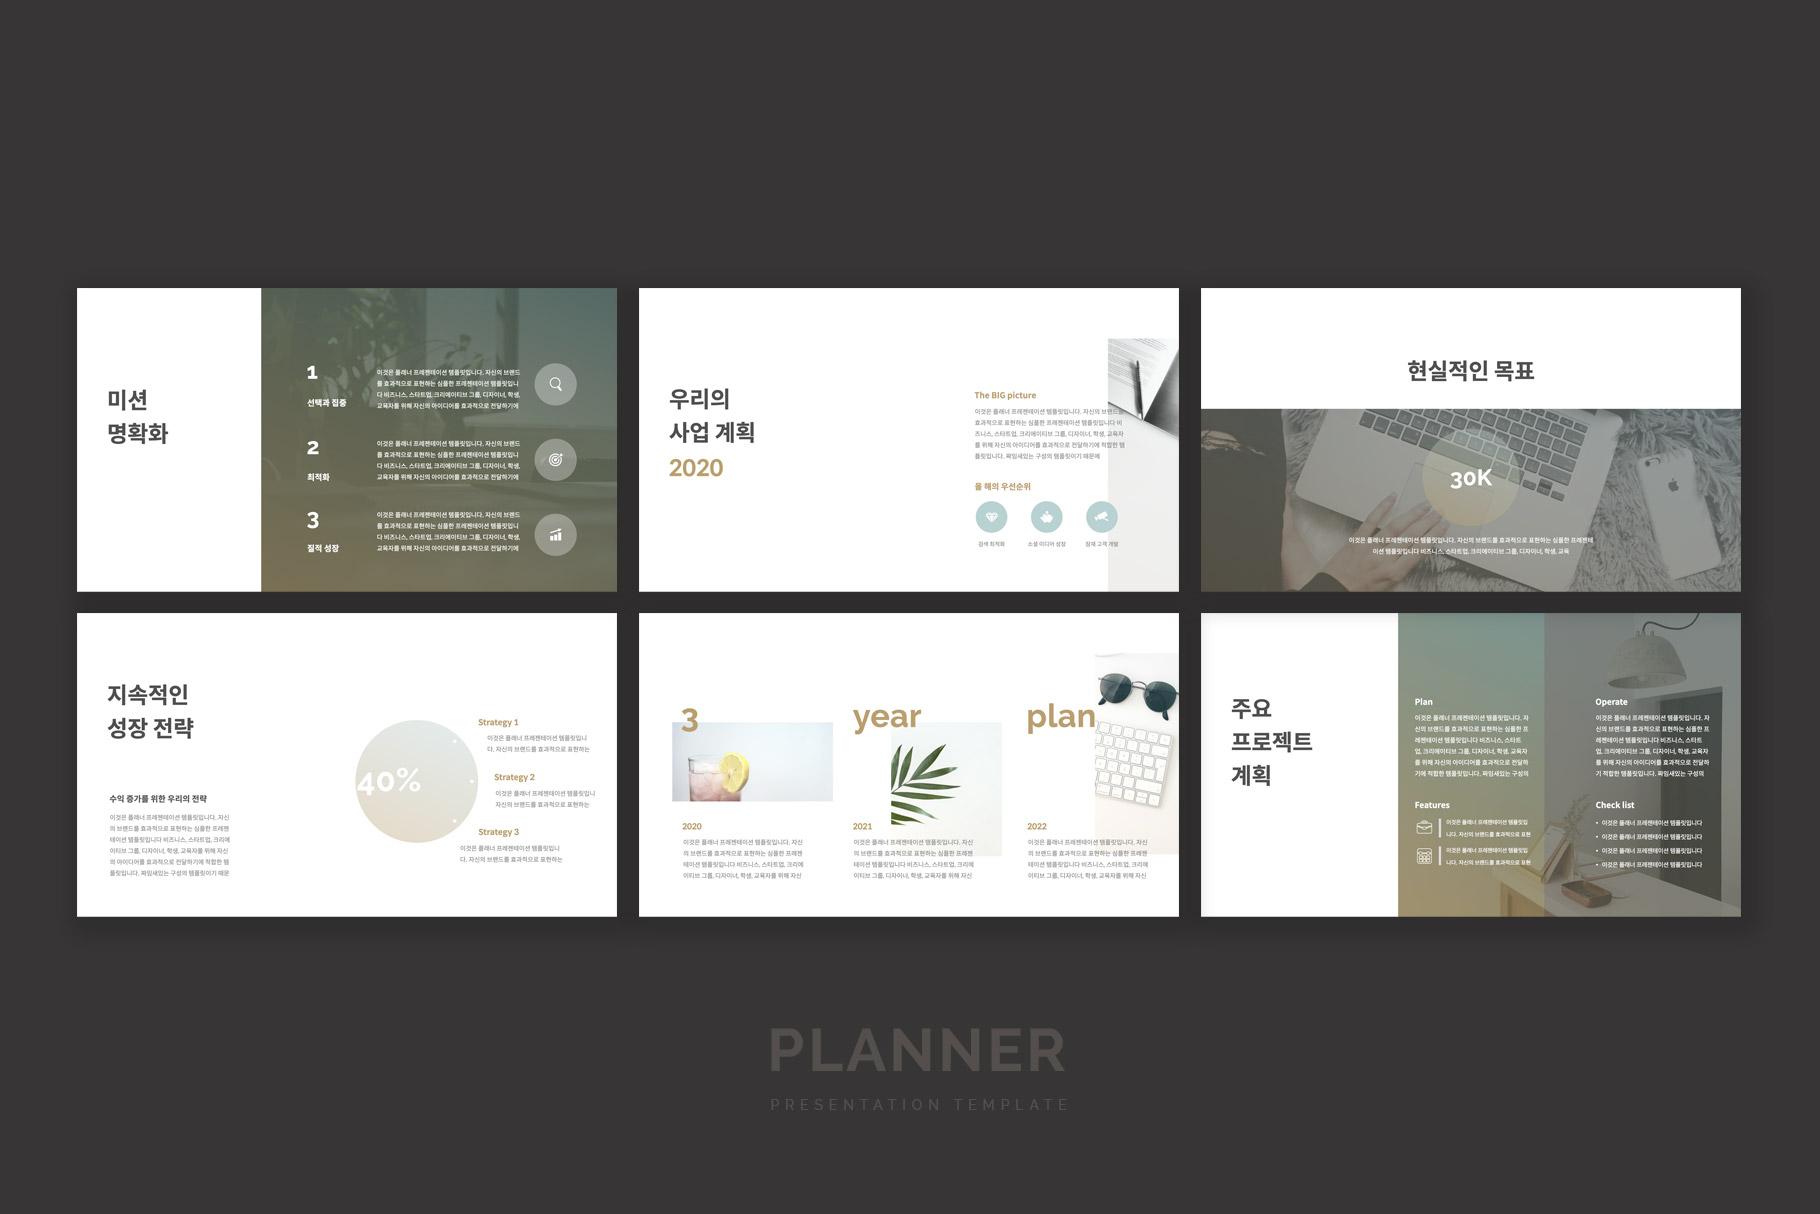 Planner Presentation Template